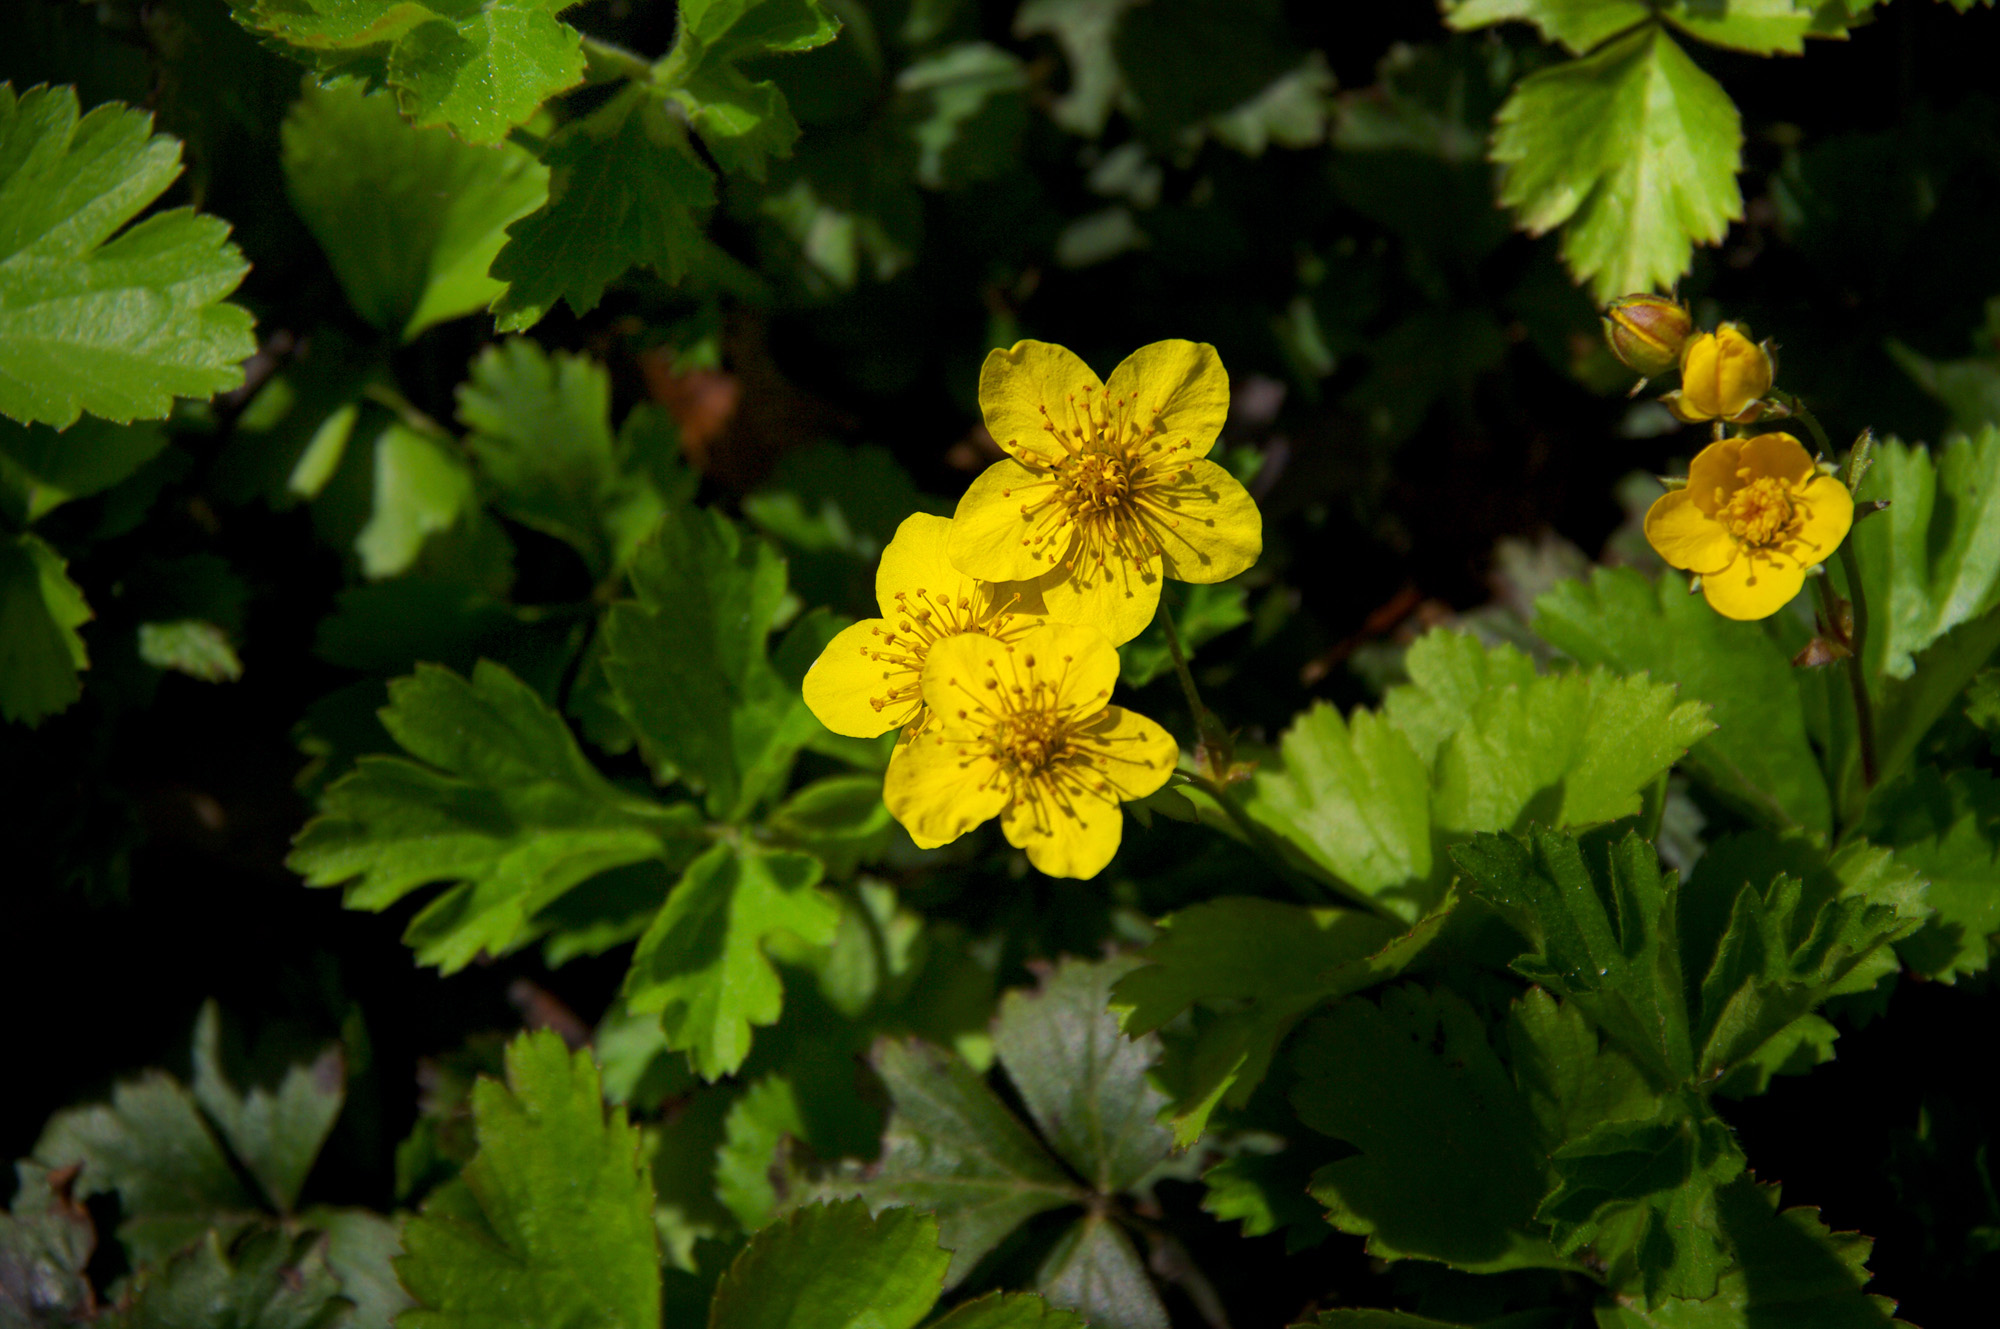 waldsteinia-ternata-bloei-imgp8546